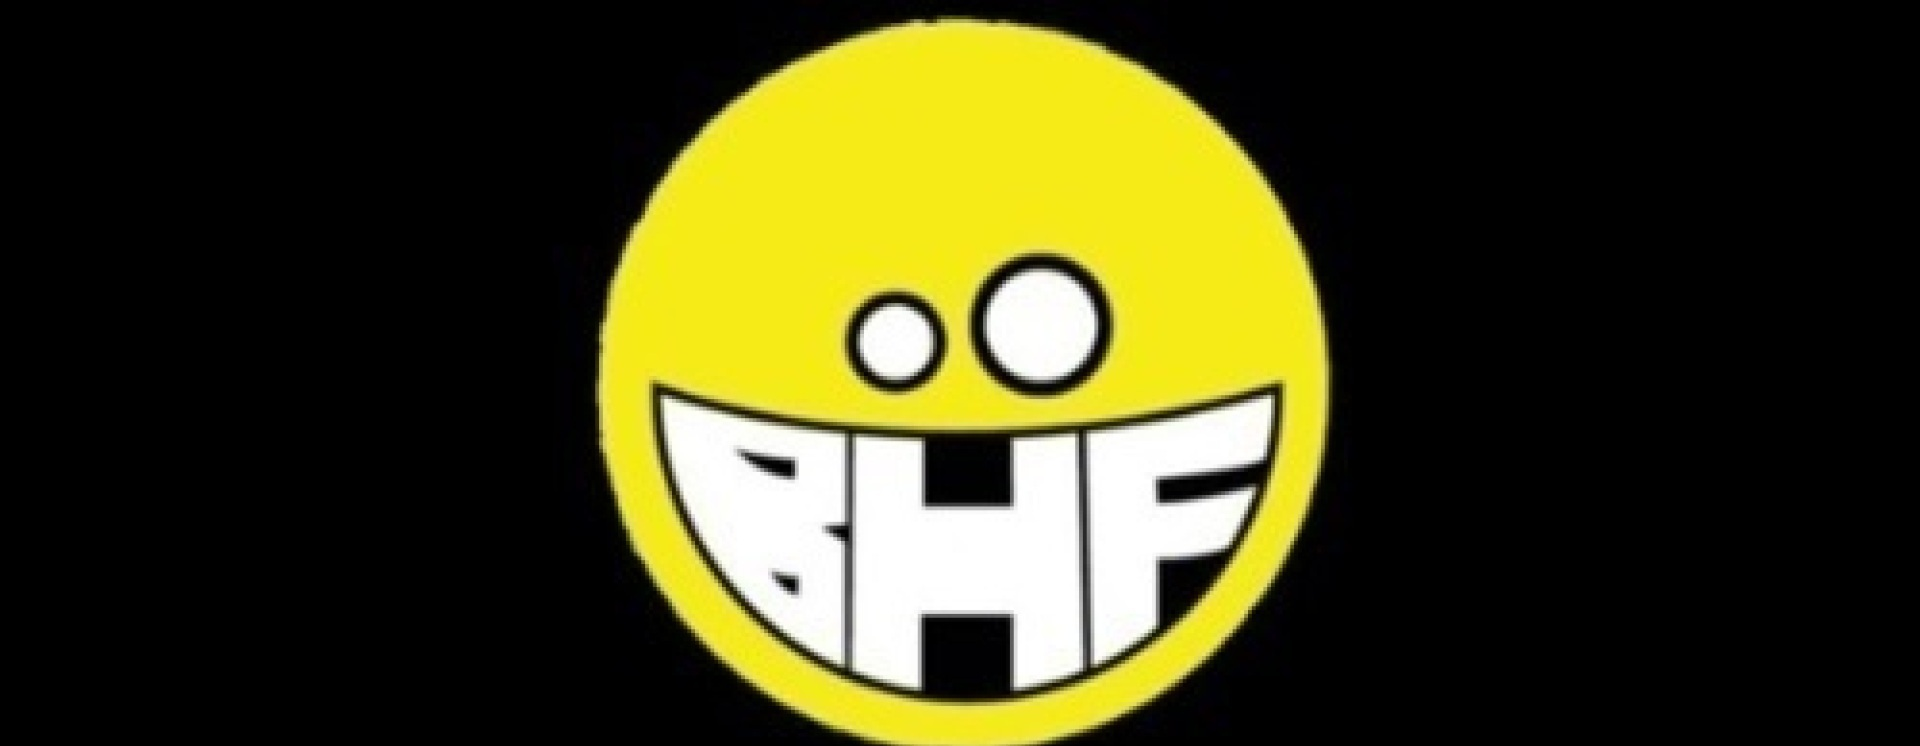 1393650272 bhf sticker logo copy